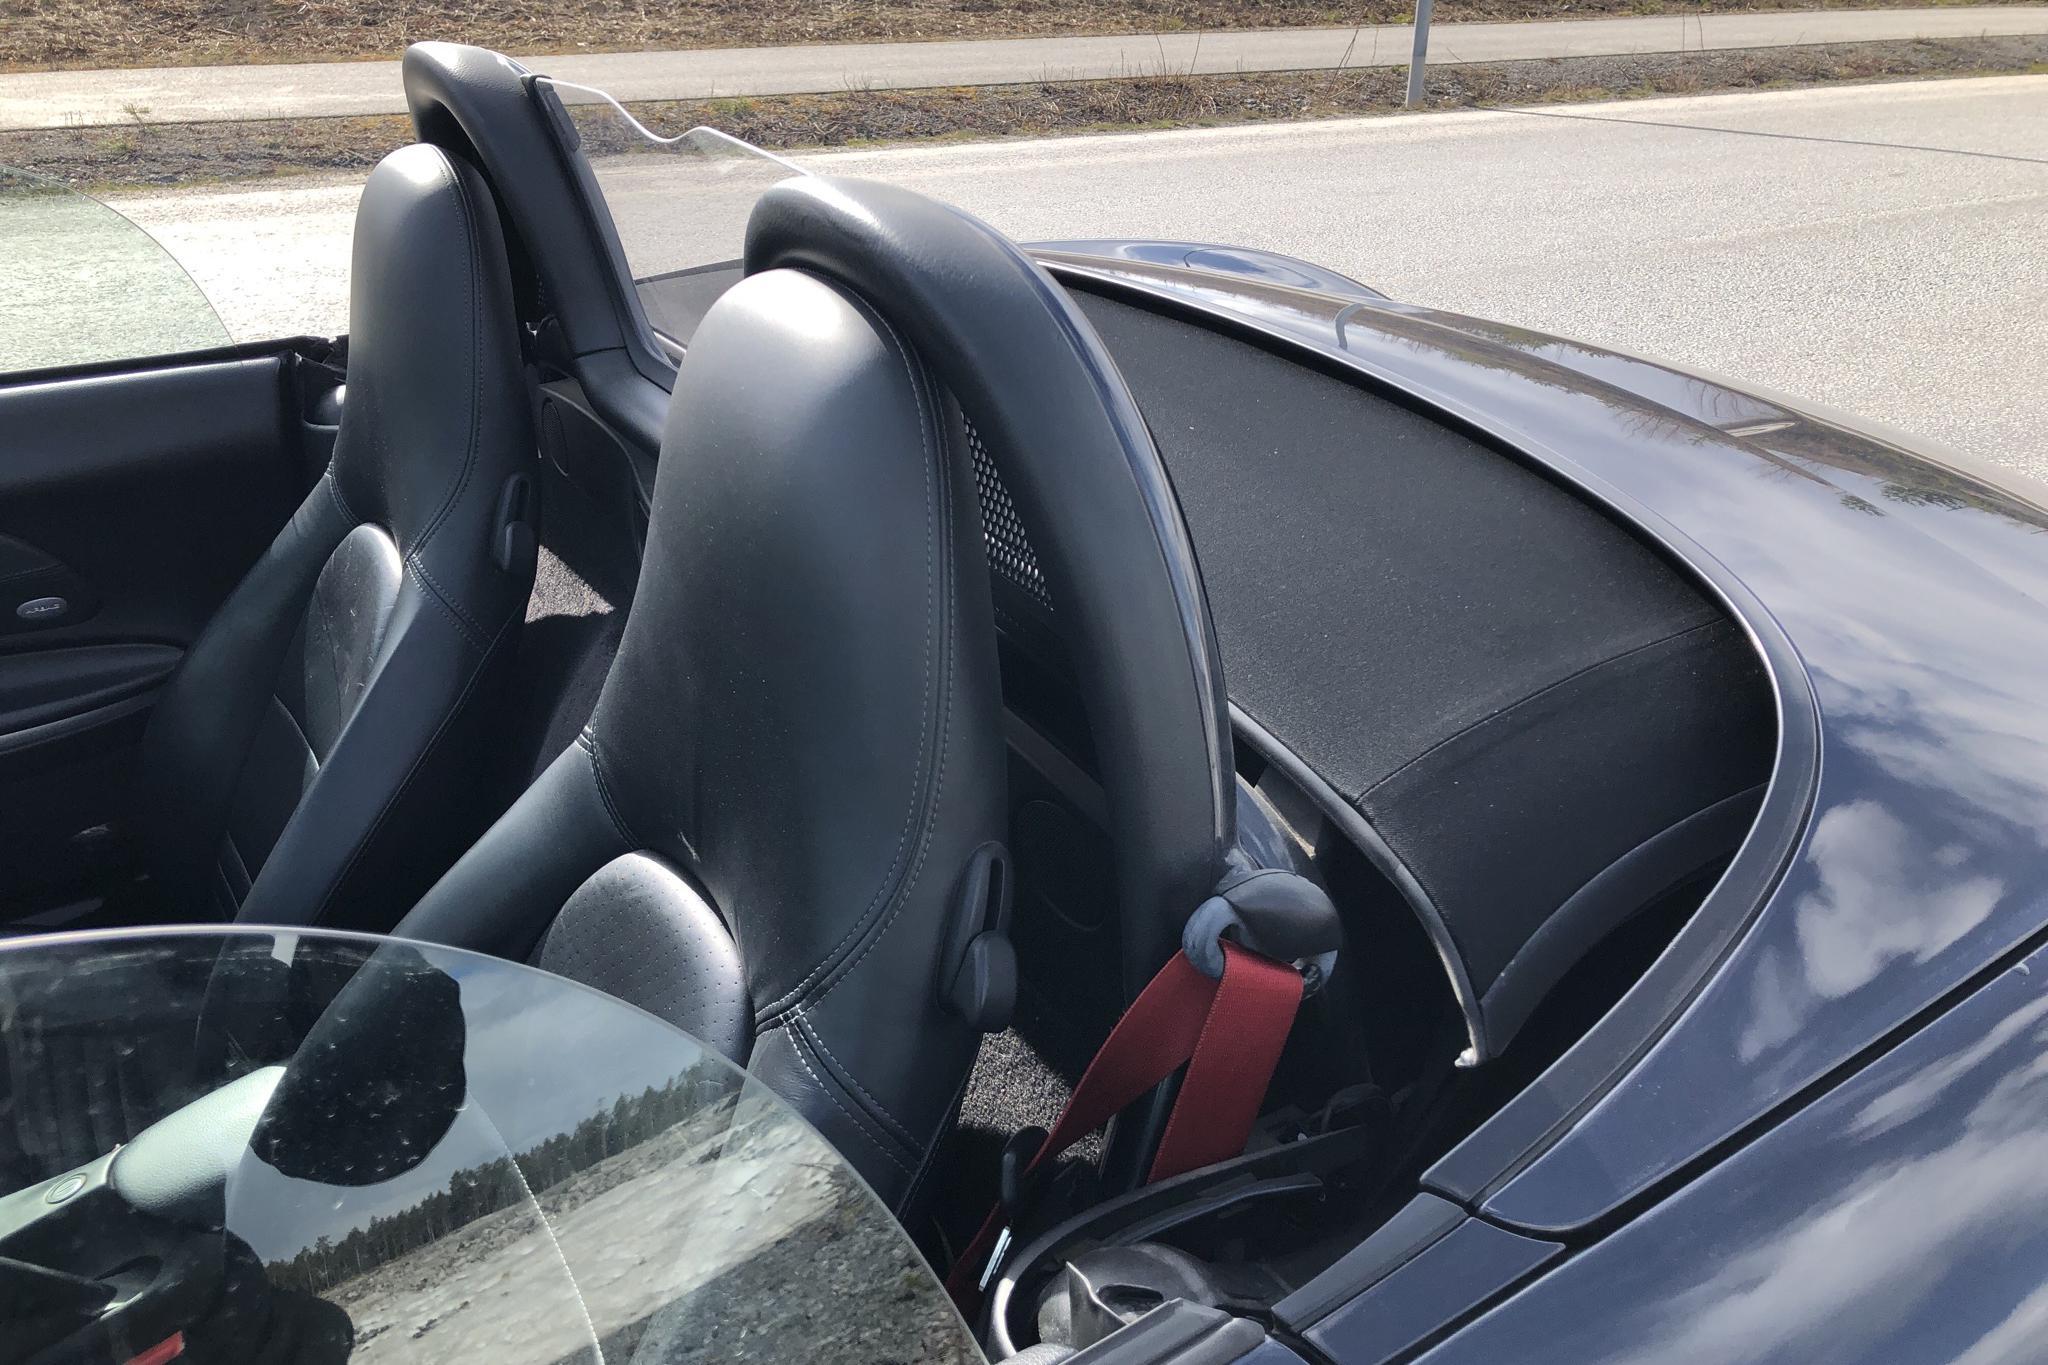 Porsche Boxster S 3.2 (260hk) - 117 230 km - Manual - Dark Blue - 2004